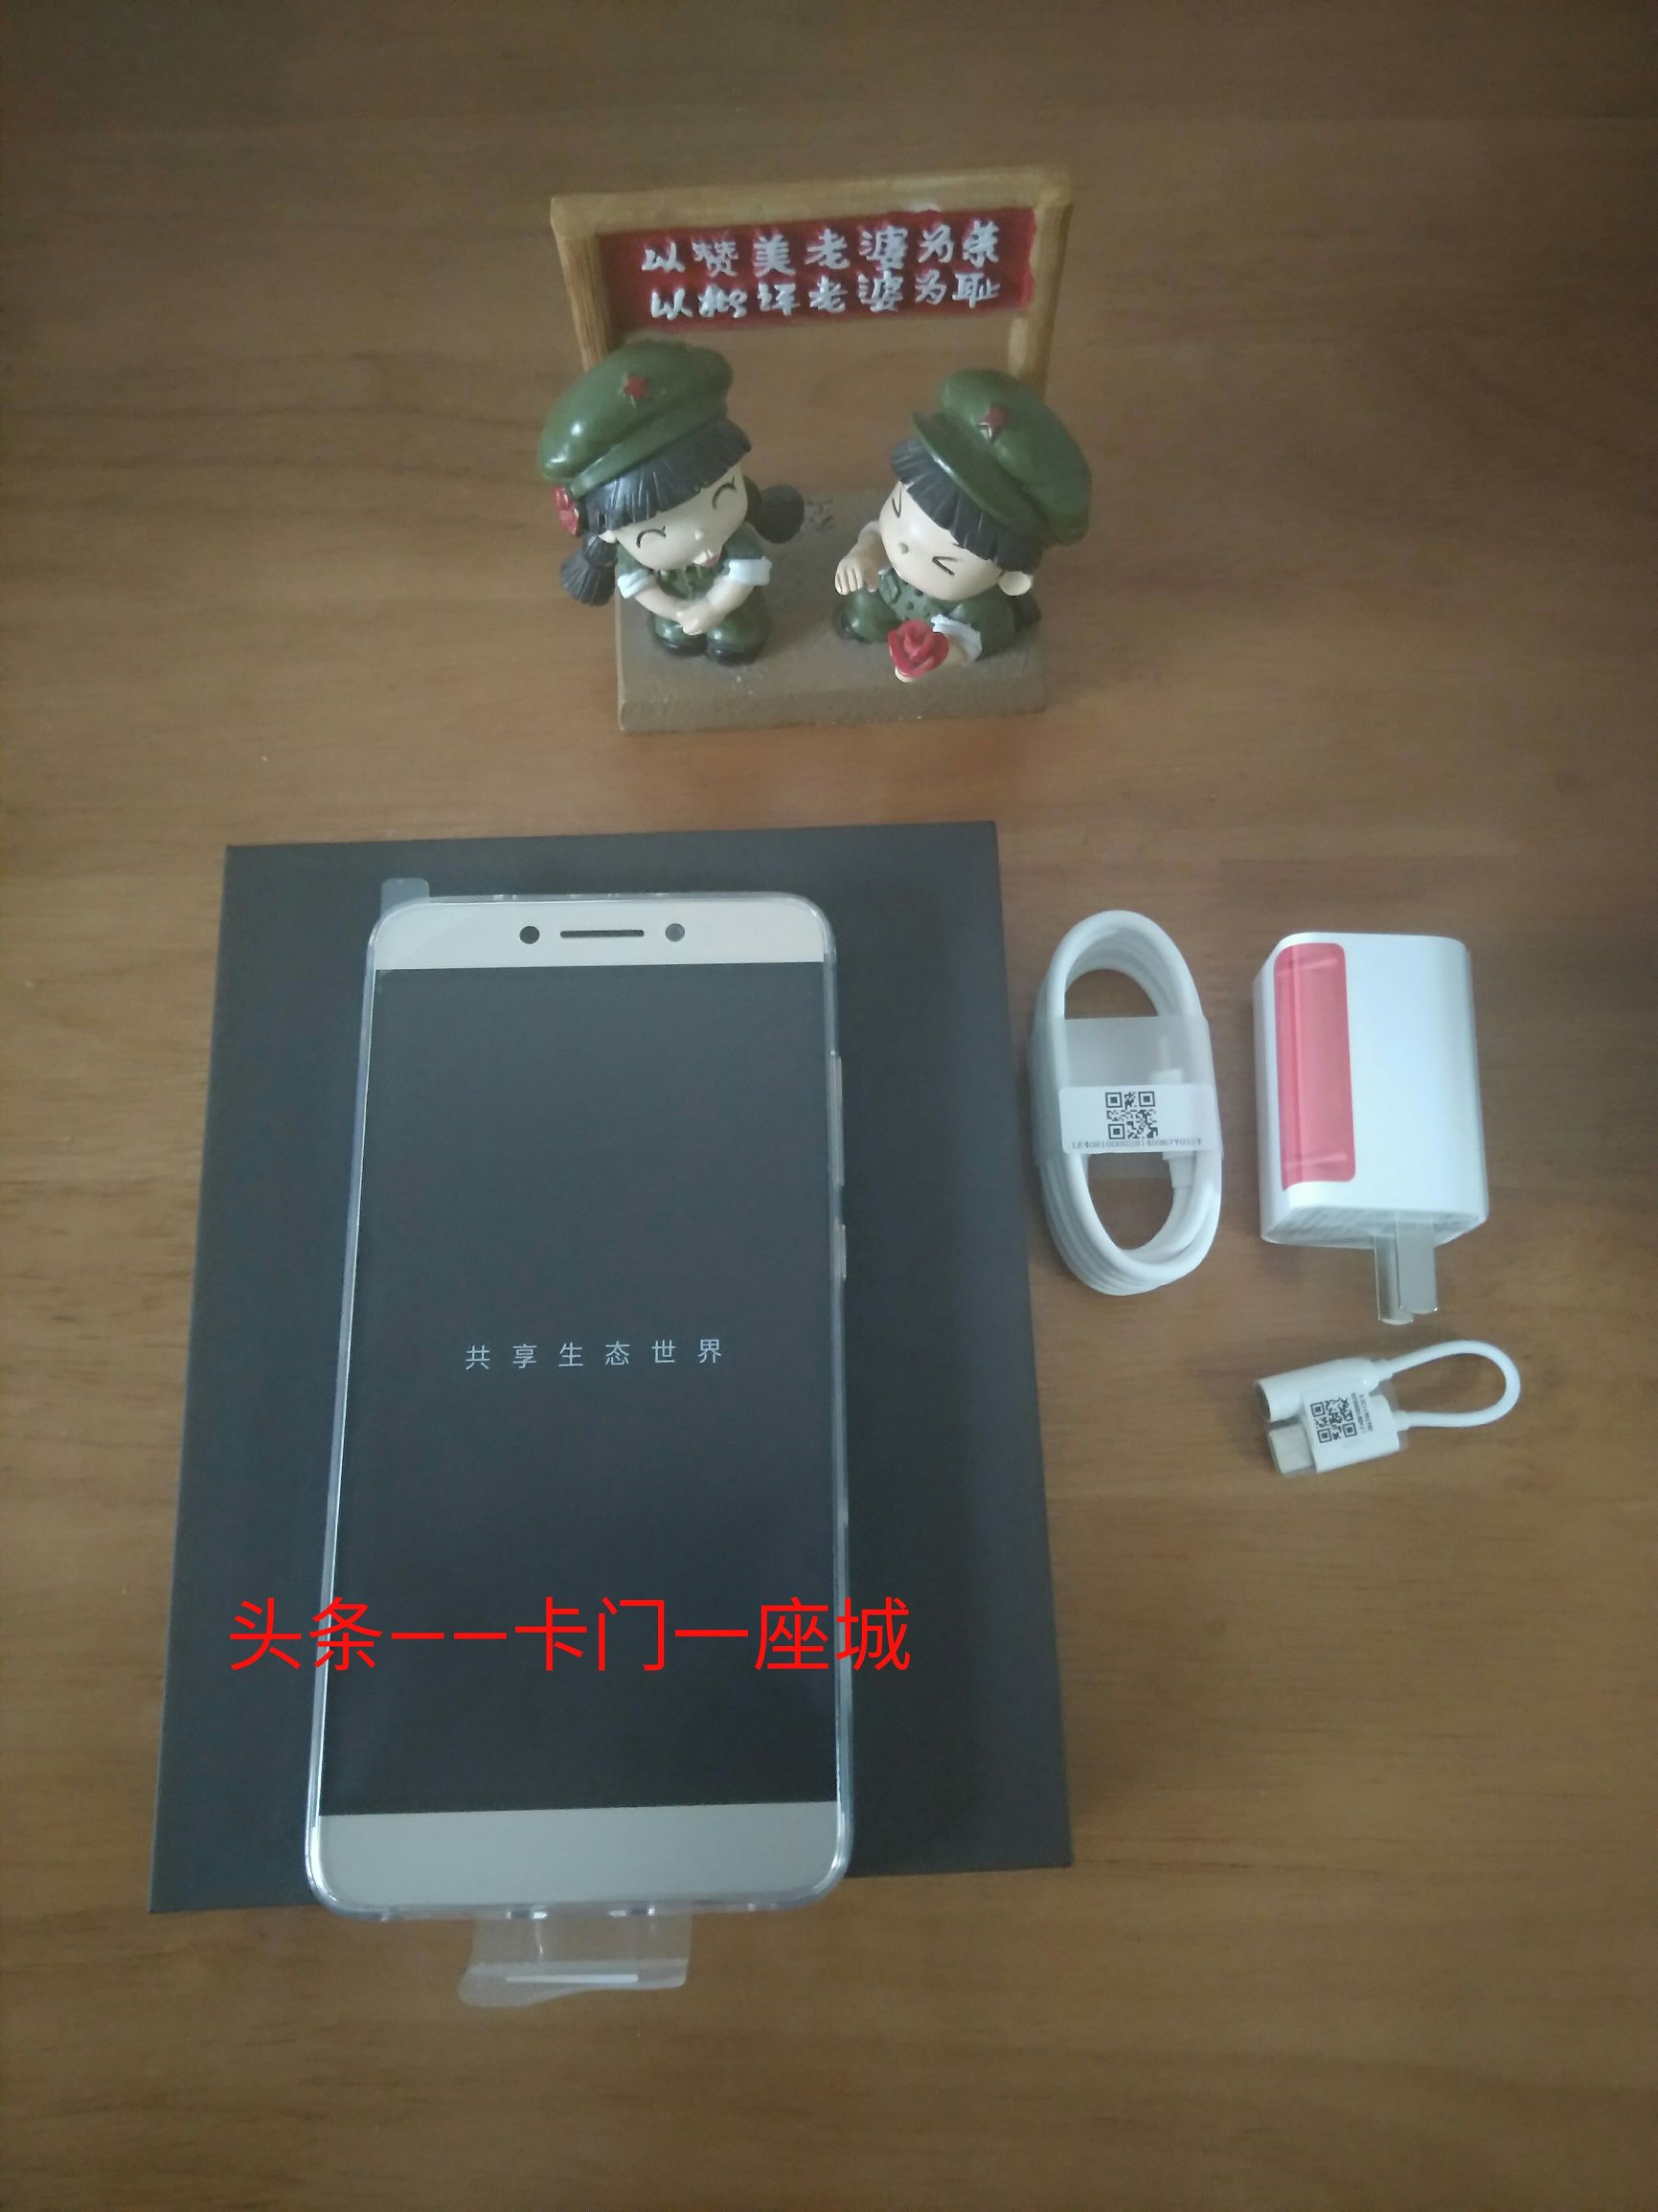 8G 64G,骁龙820血满版,乐视电视MAX4开箱